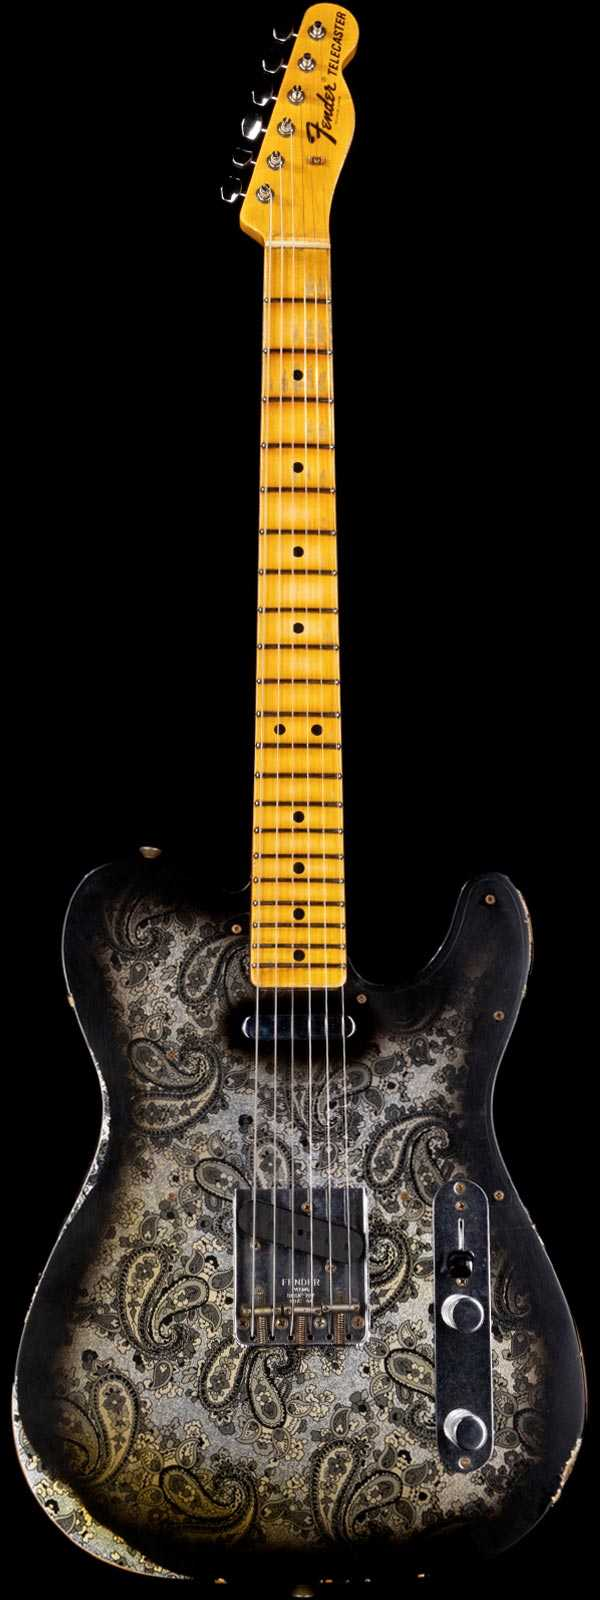 Fender Custom Shop Limited 1968 Telecaster Heavy Relic Black Paisley